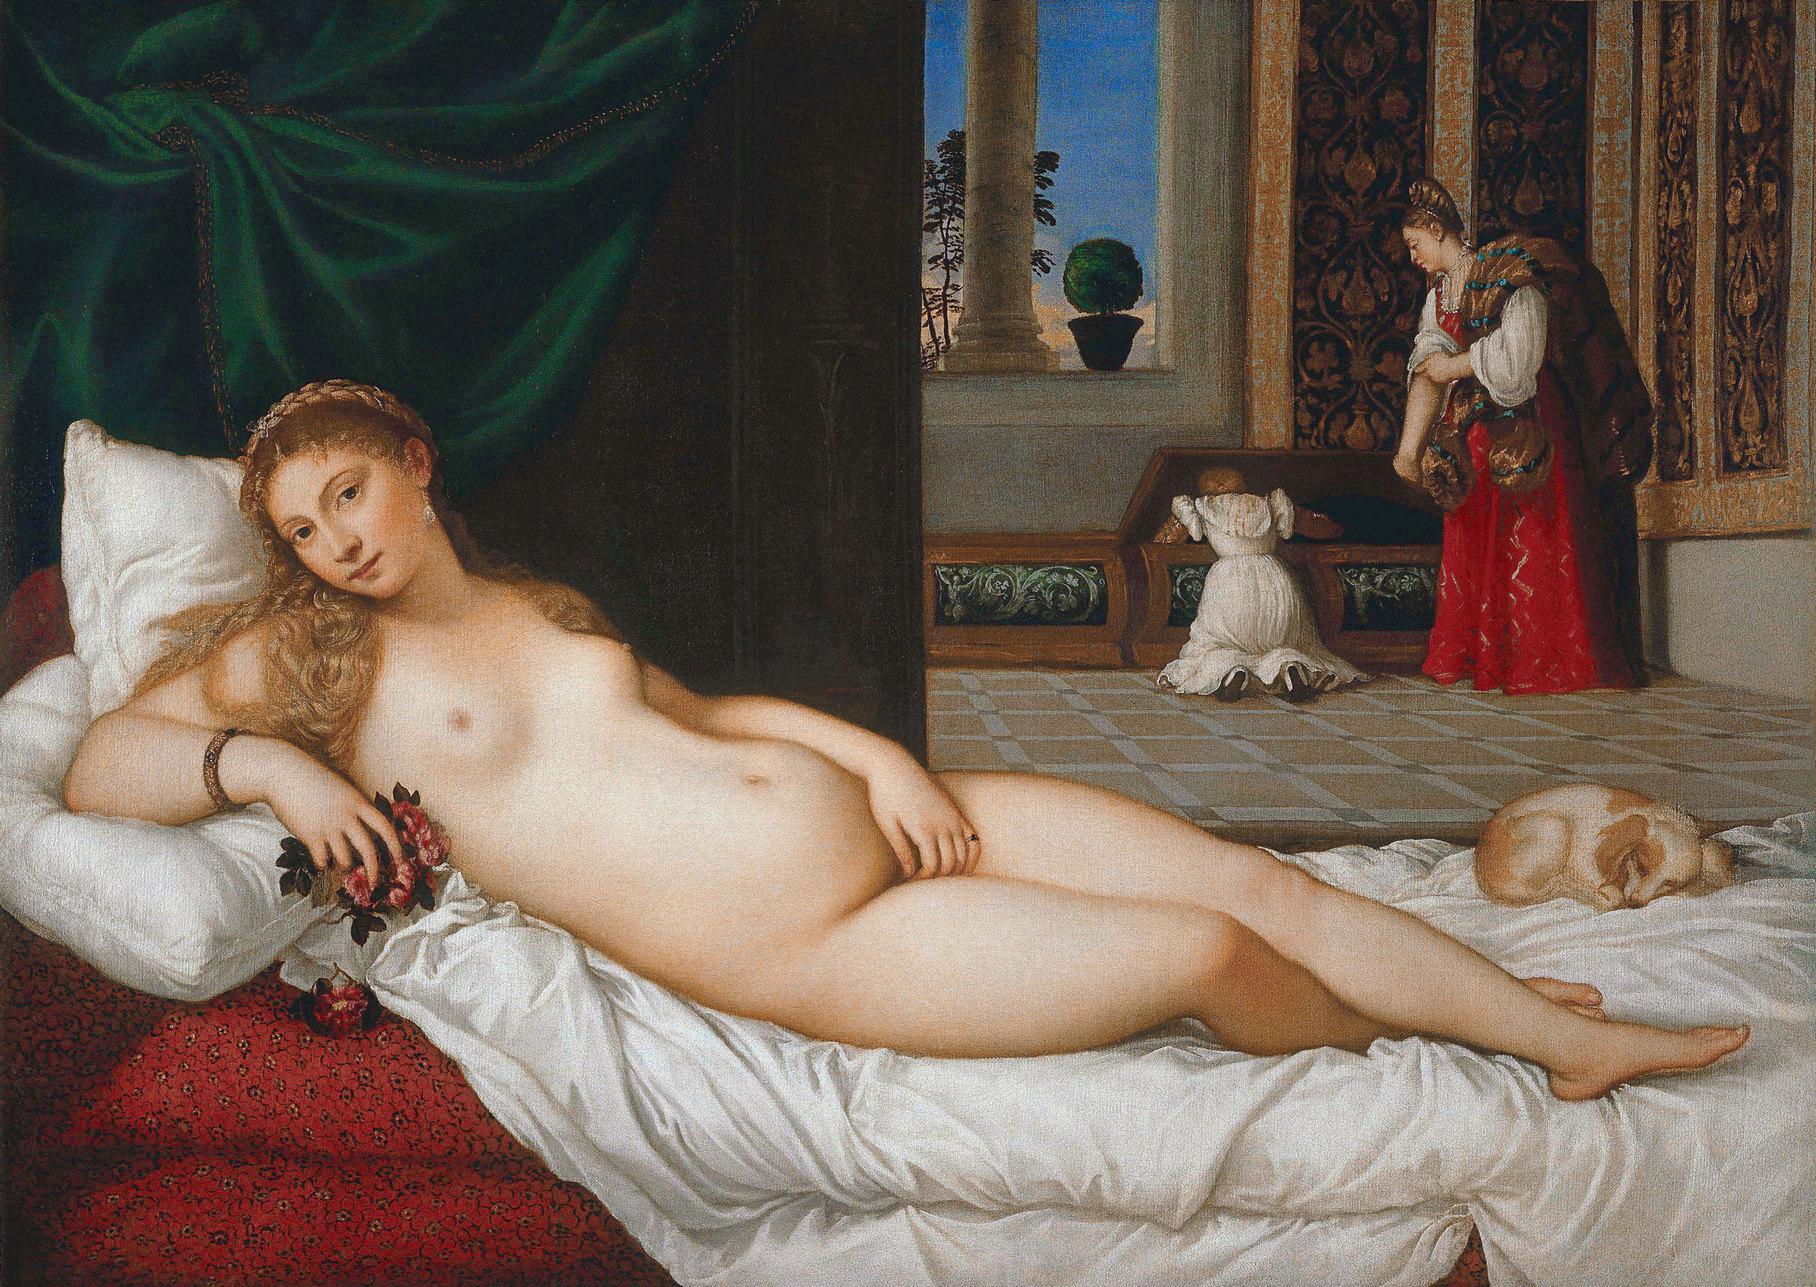 Тициан. Венера Урбинская. 1538 год. Галерея Уффици, Флоренция